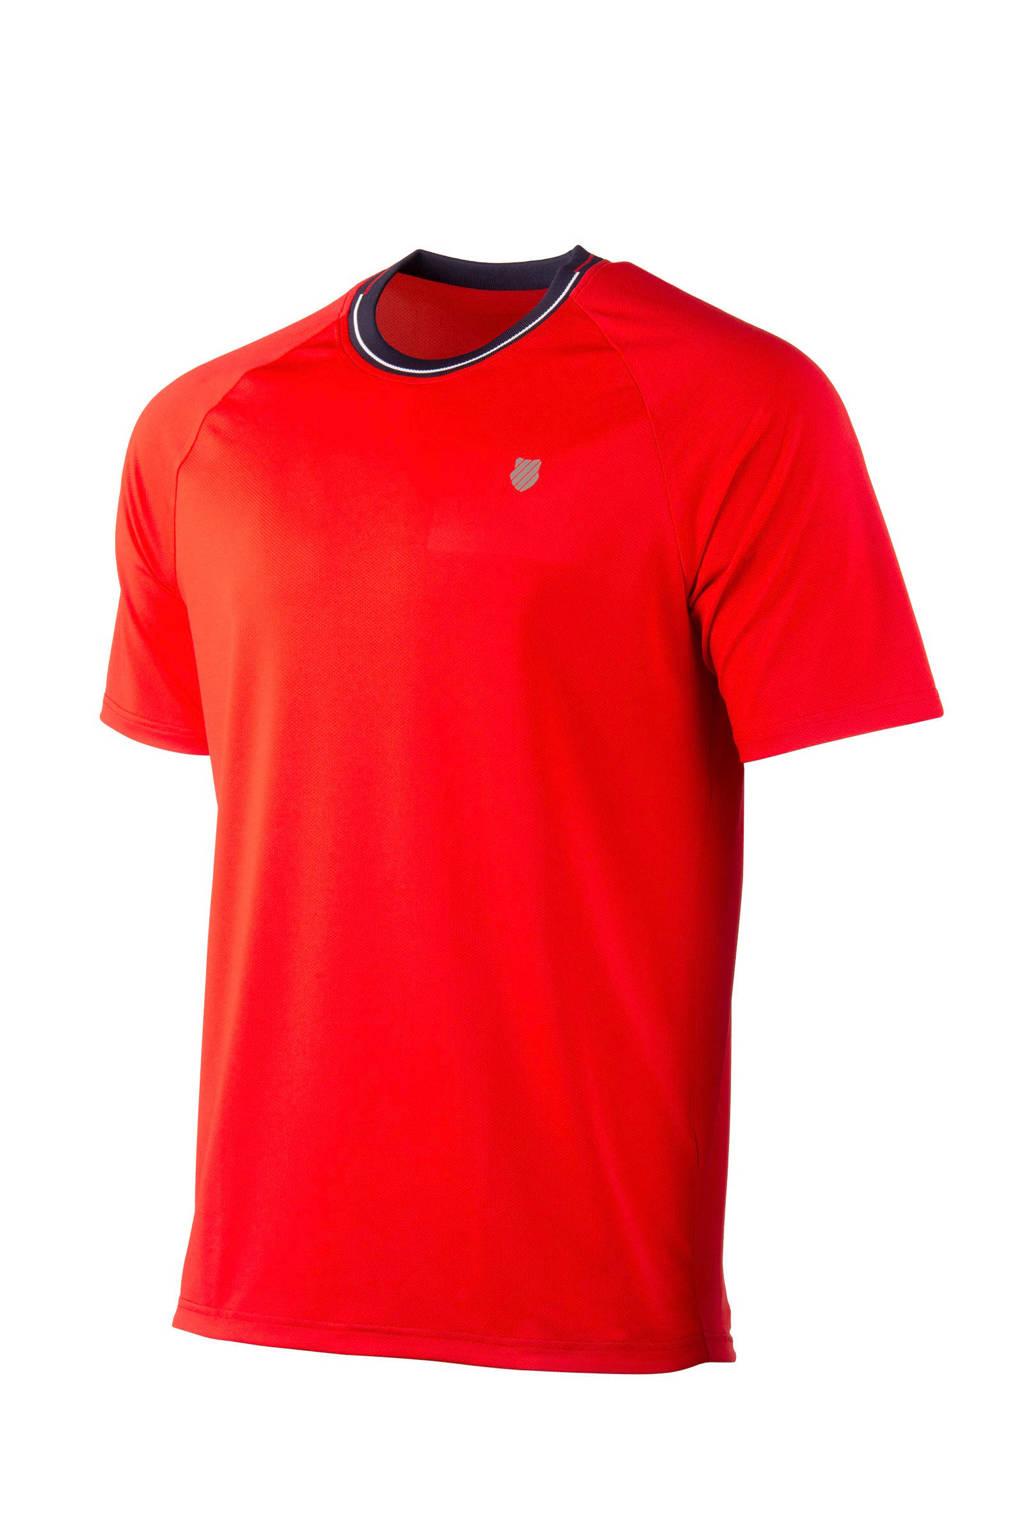 K-Swiss   sport T-shirt rood, Rood